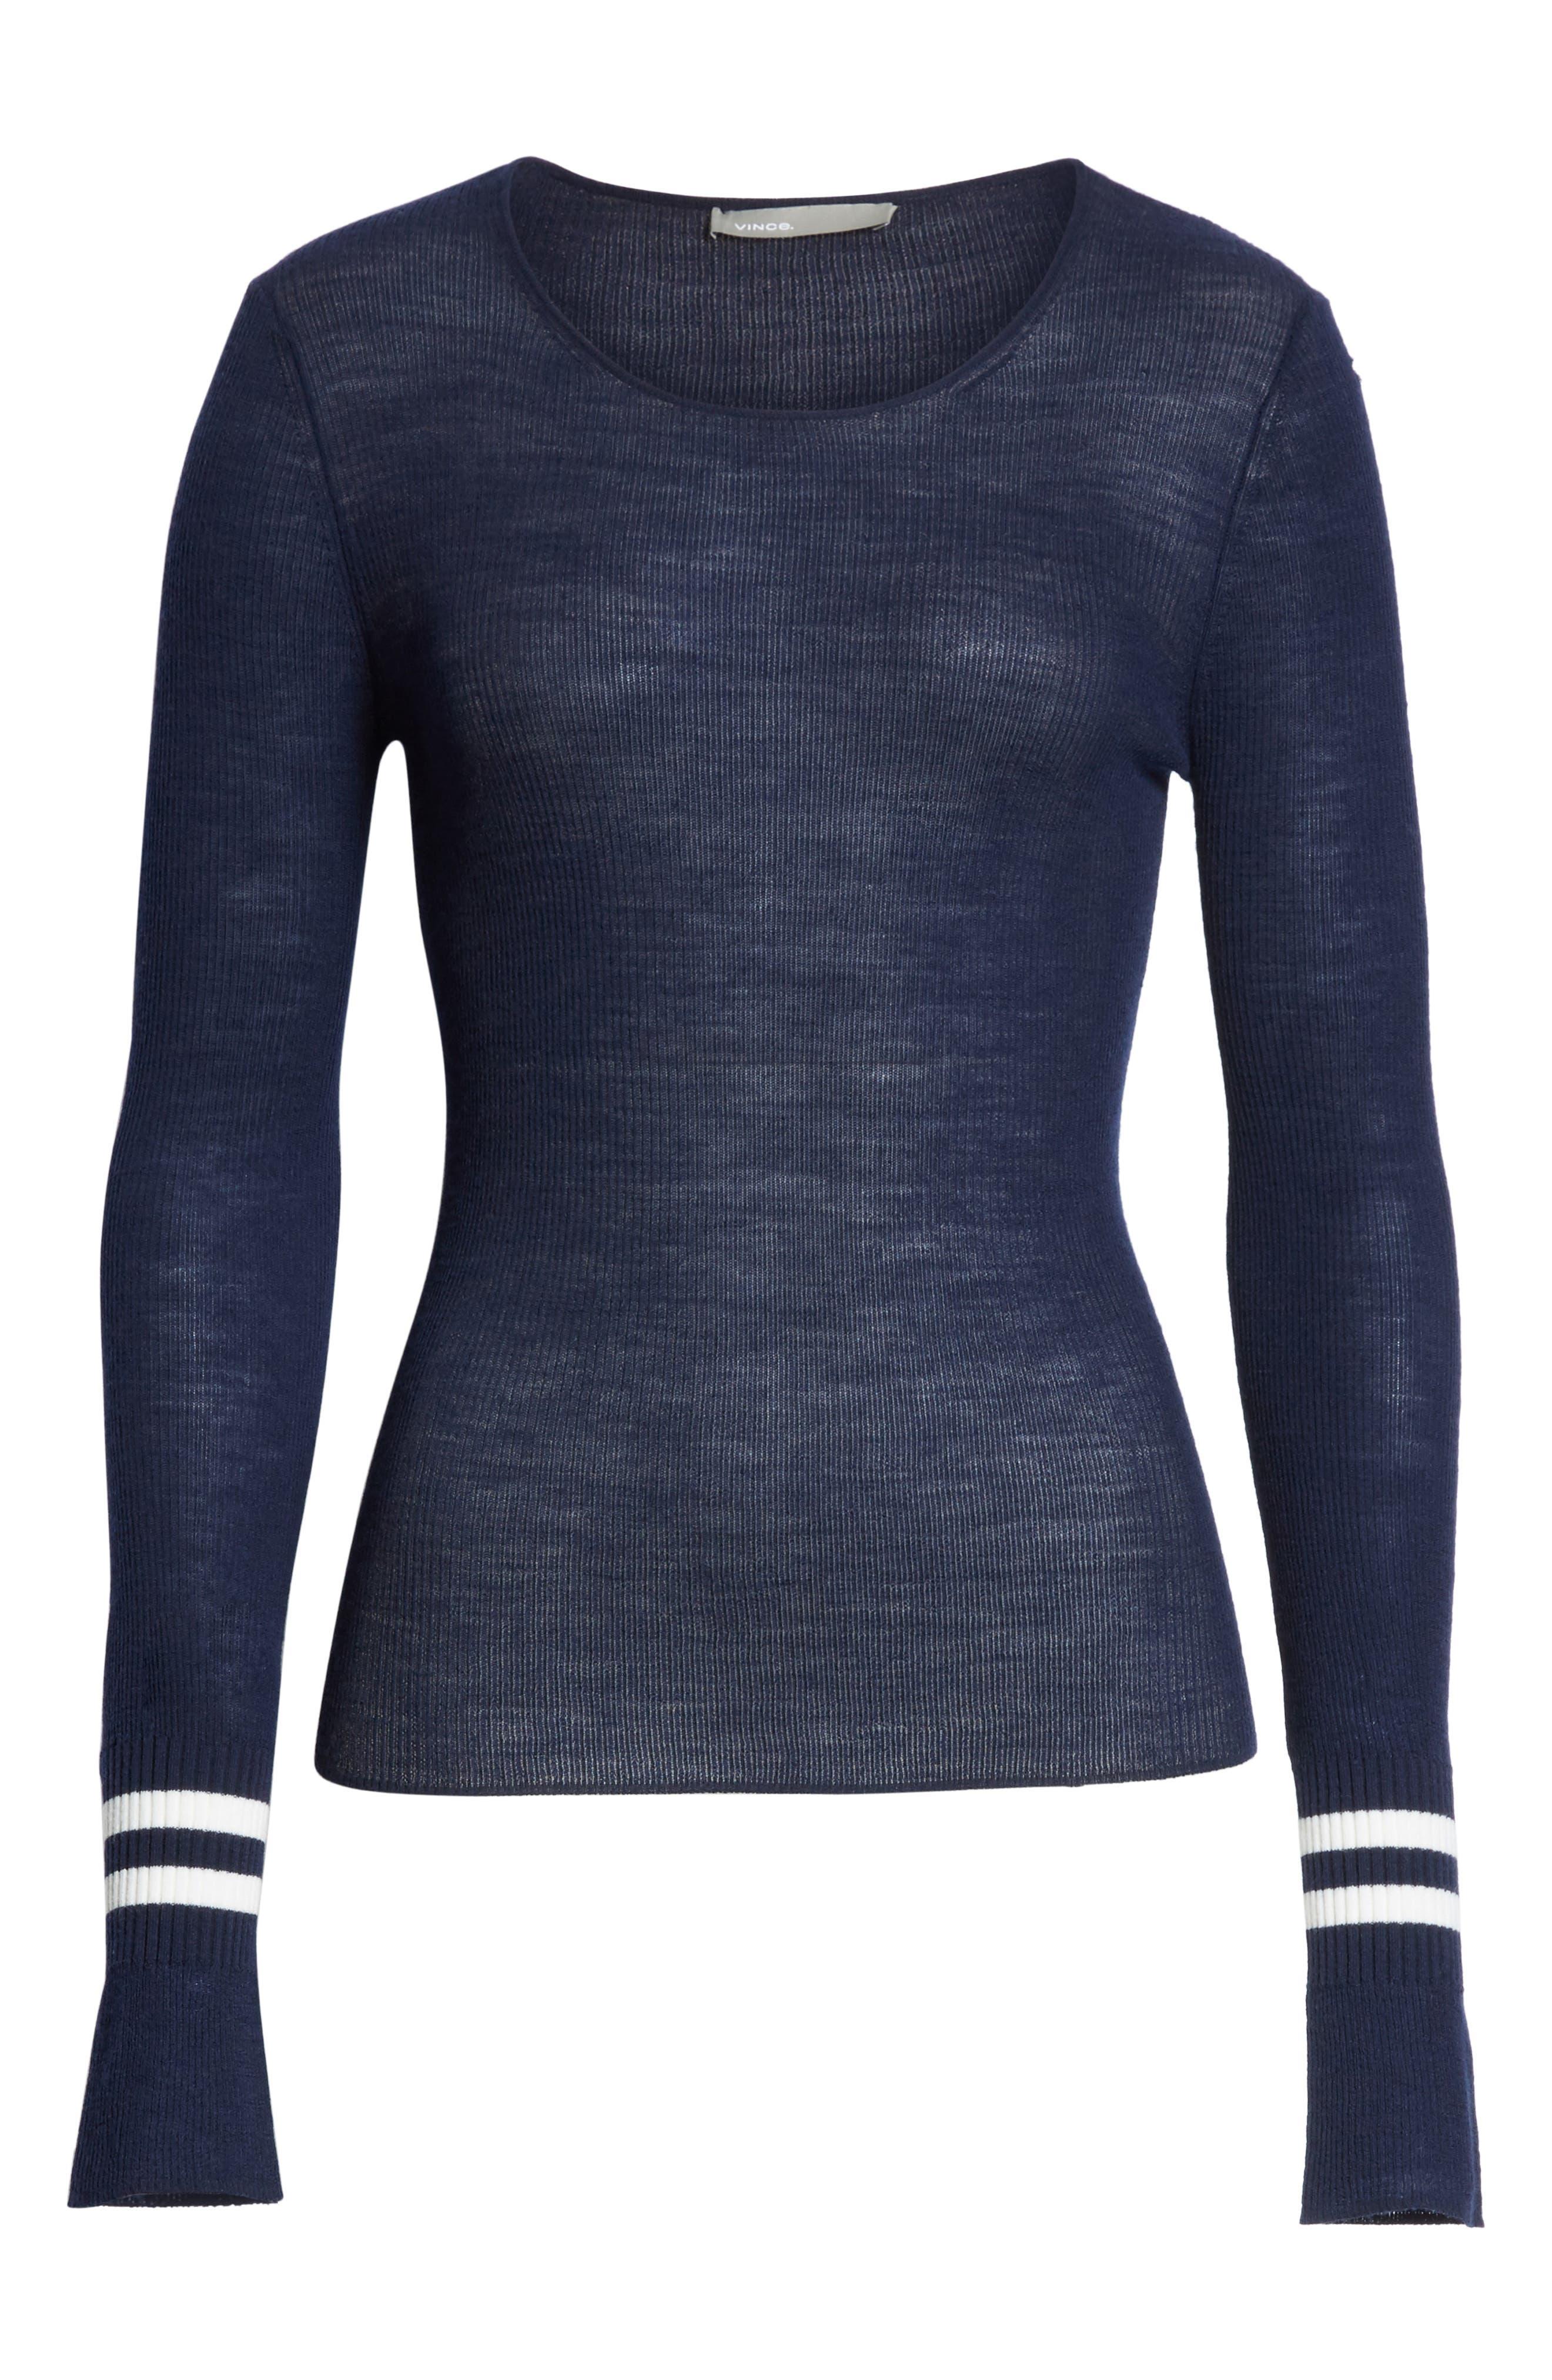 Stripe Cuff Wool Sweater,                             Alternate thumbnail 6, color,                             Coastal/ Optic White